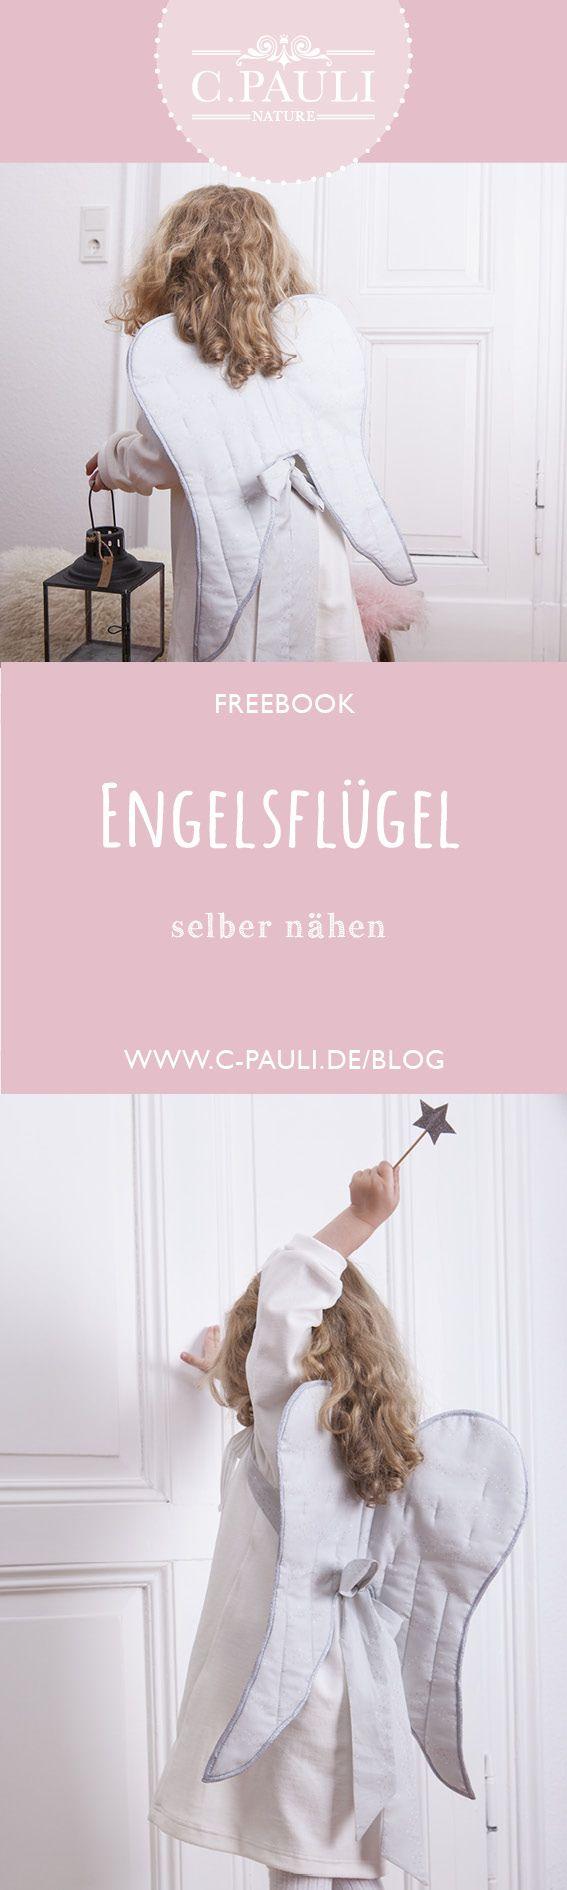 Engelsflügel   C.Pauli Nature Blog